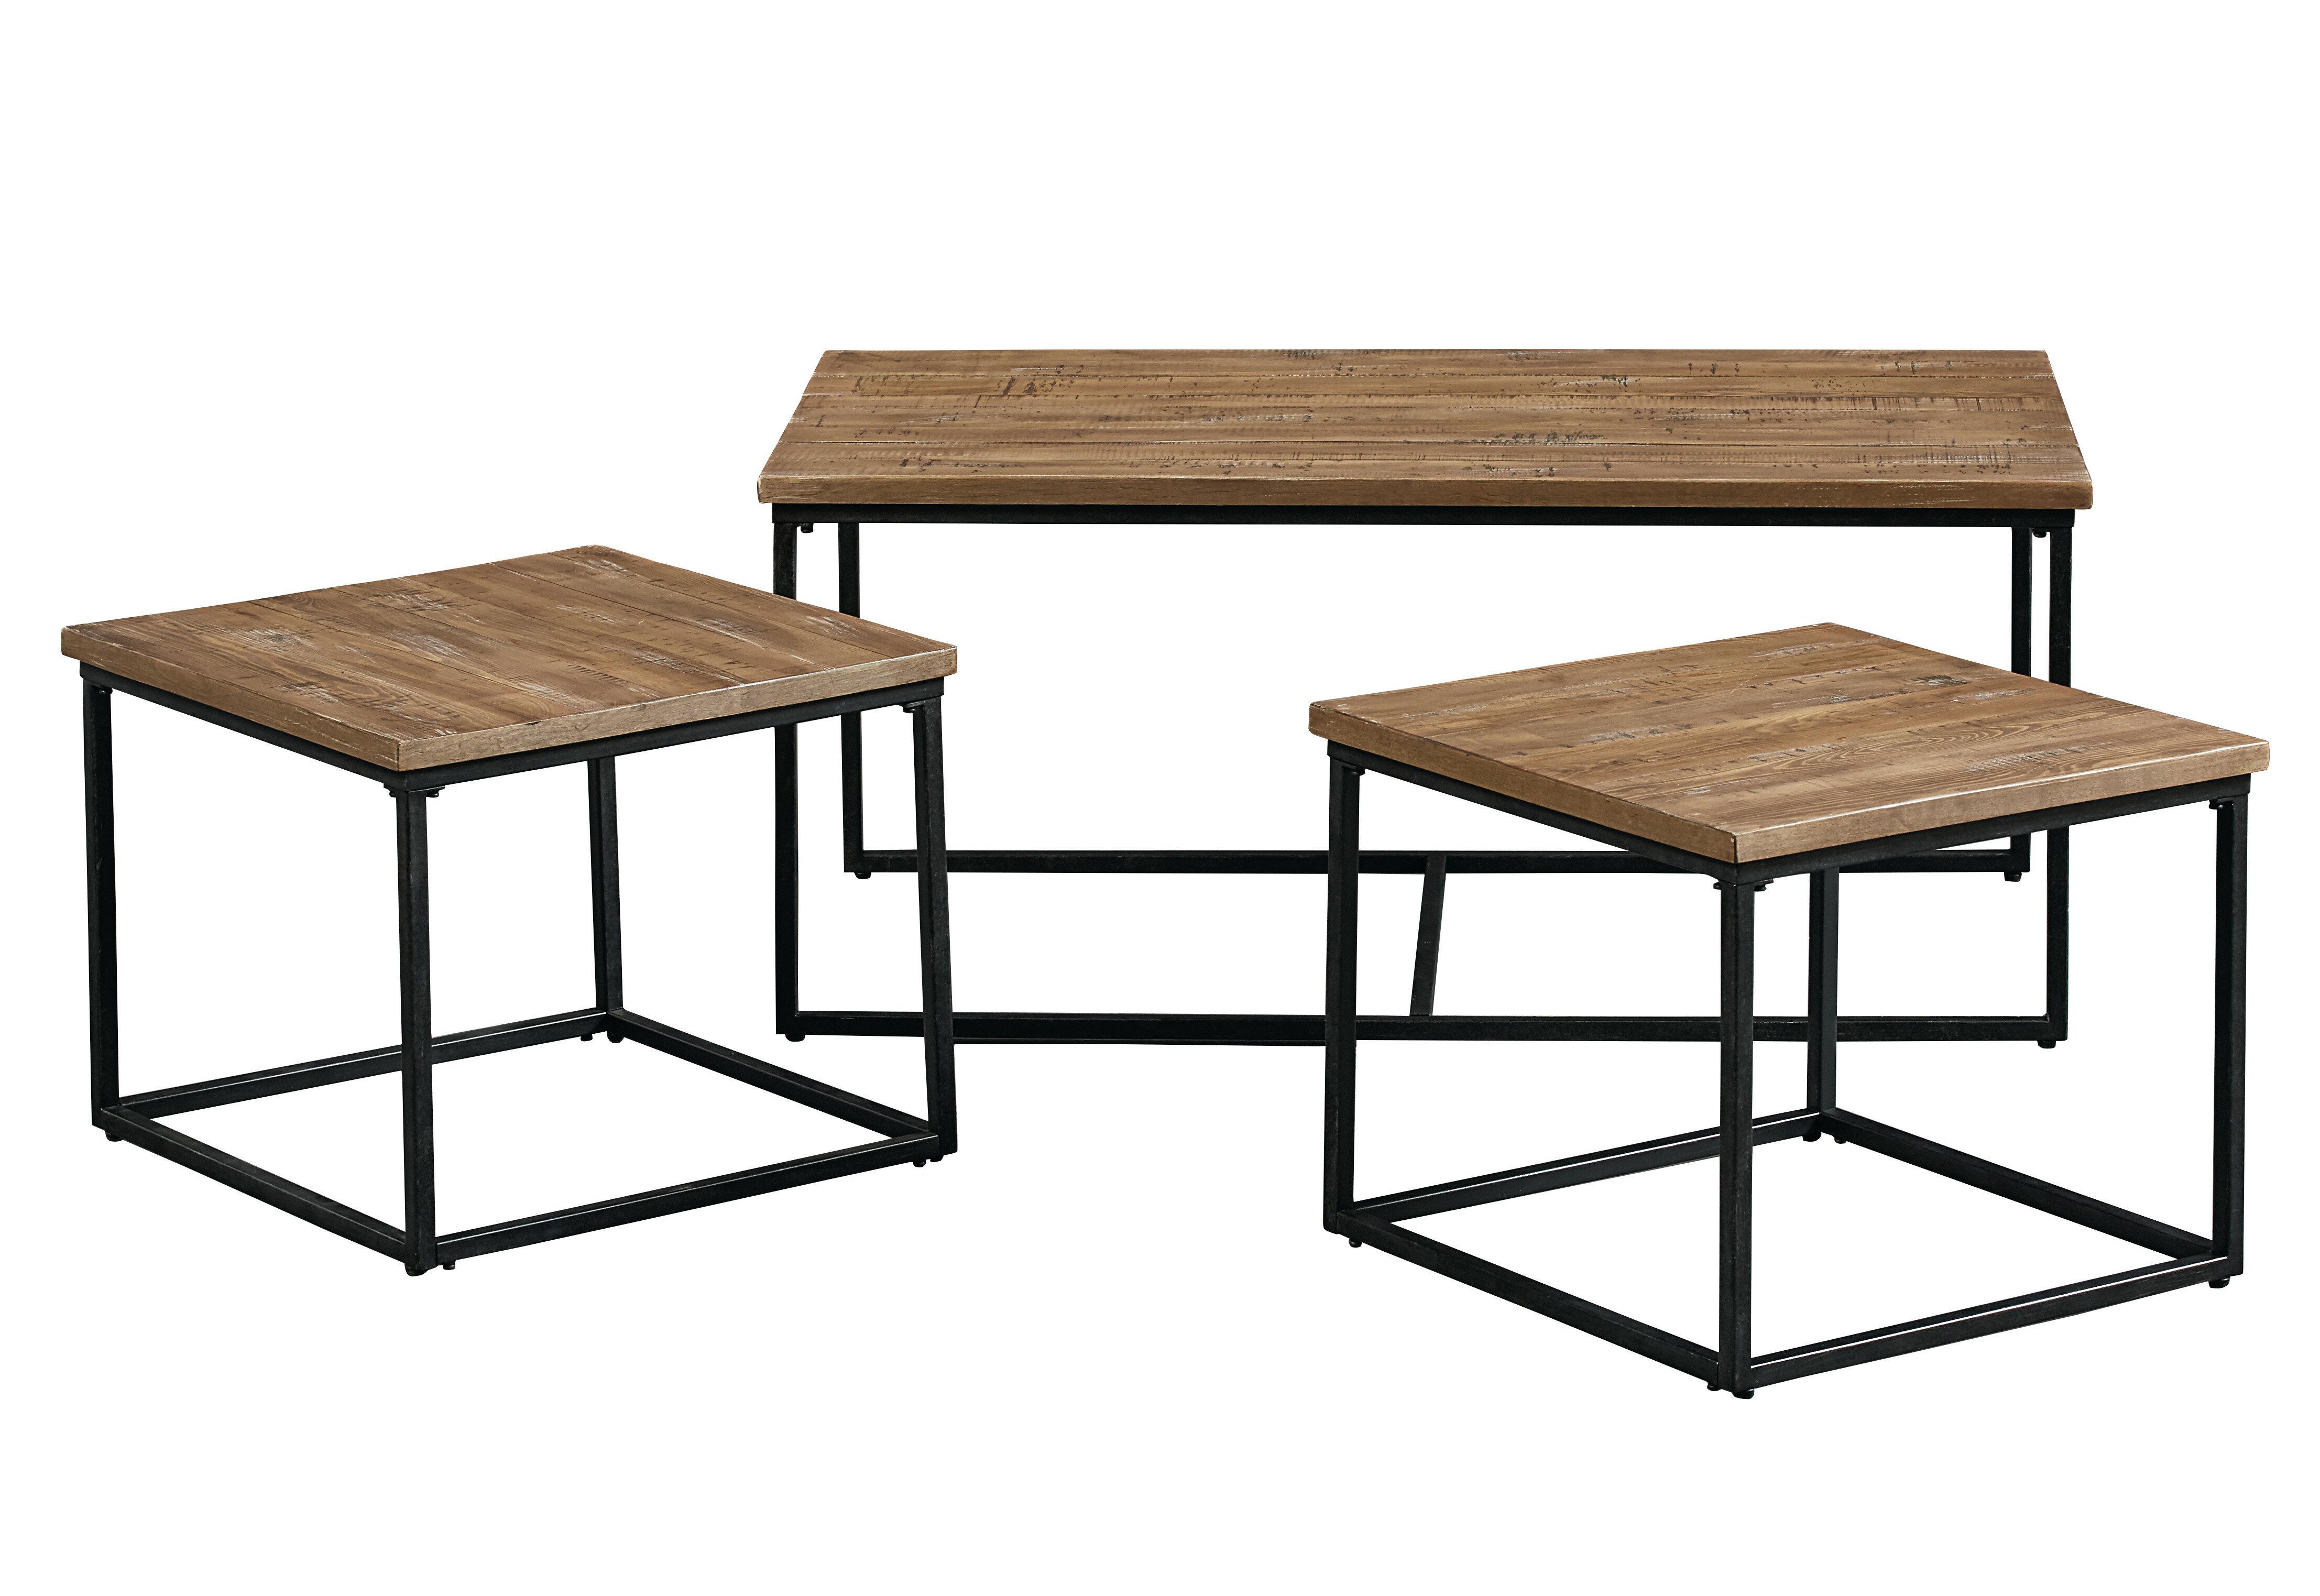 Wood And Metal Multi Level Coffee Table.Ridgewood 3 Piece Coffee Table Set